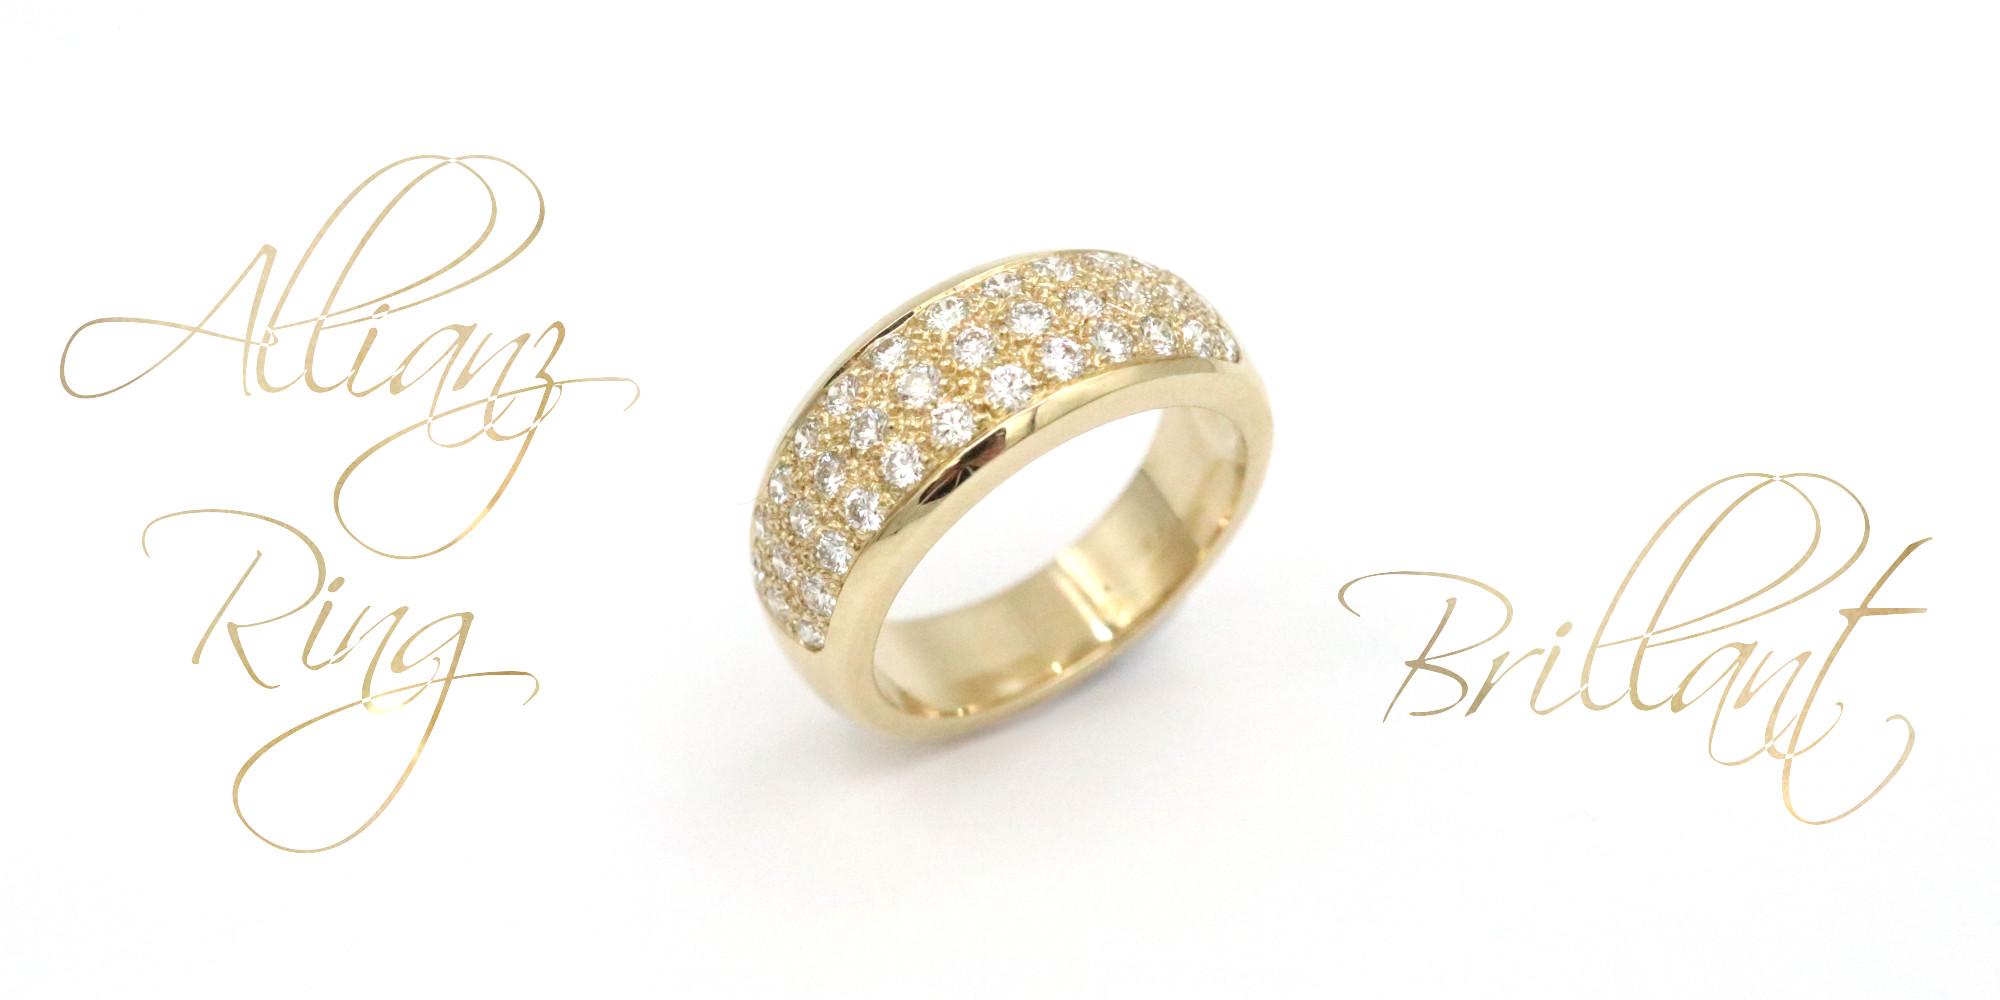 Brillant Allianz Ring Goldschmiede Mace